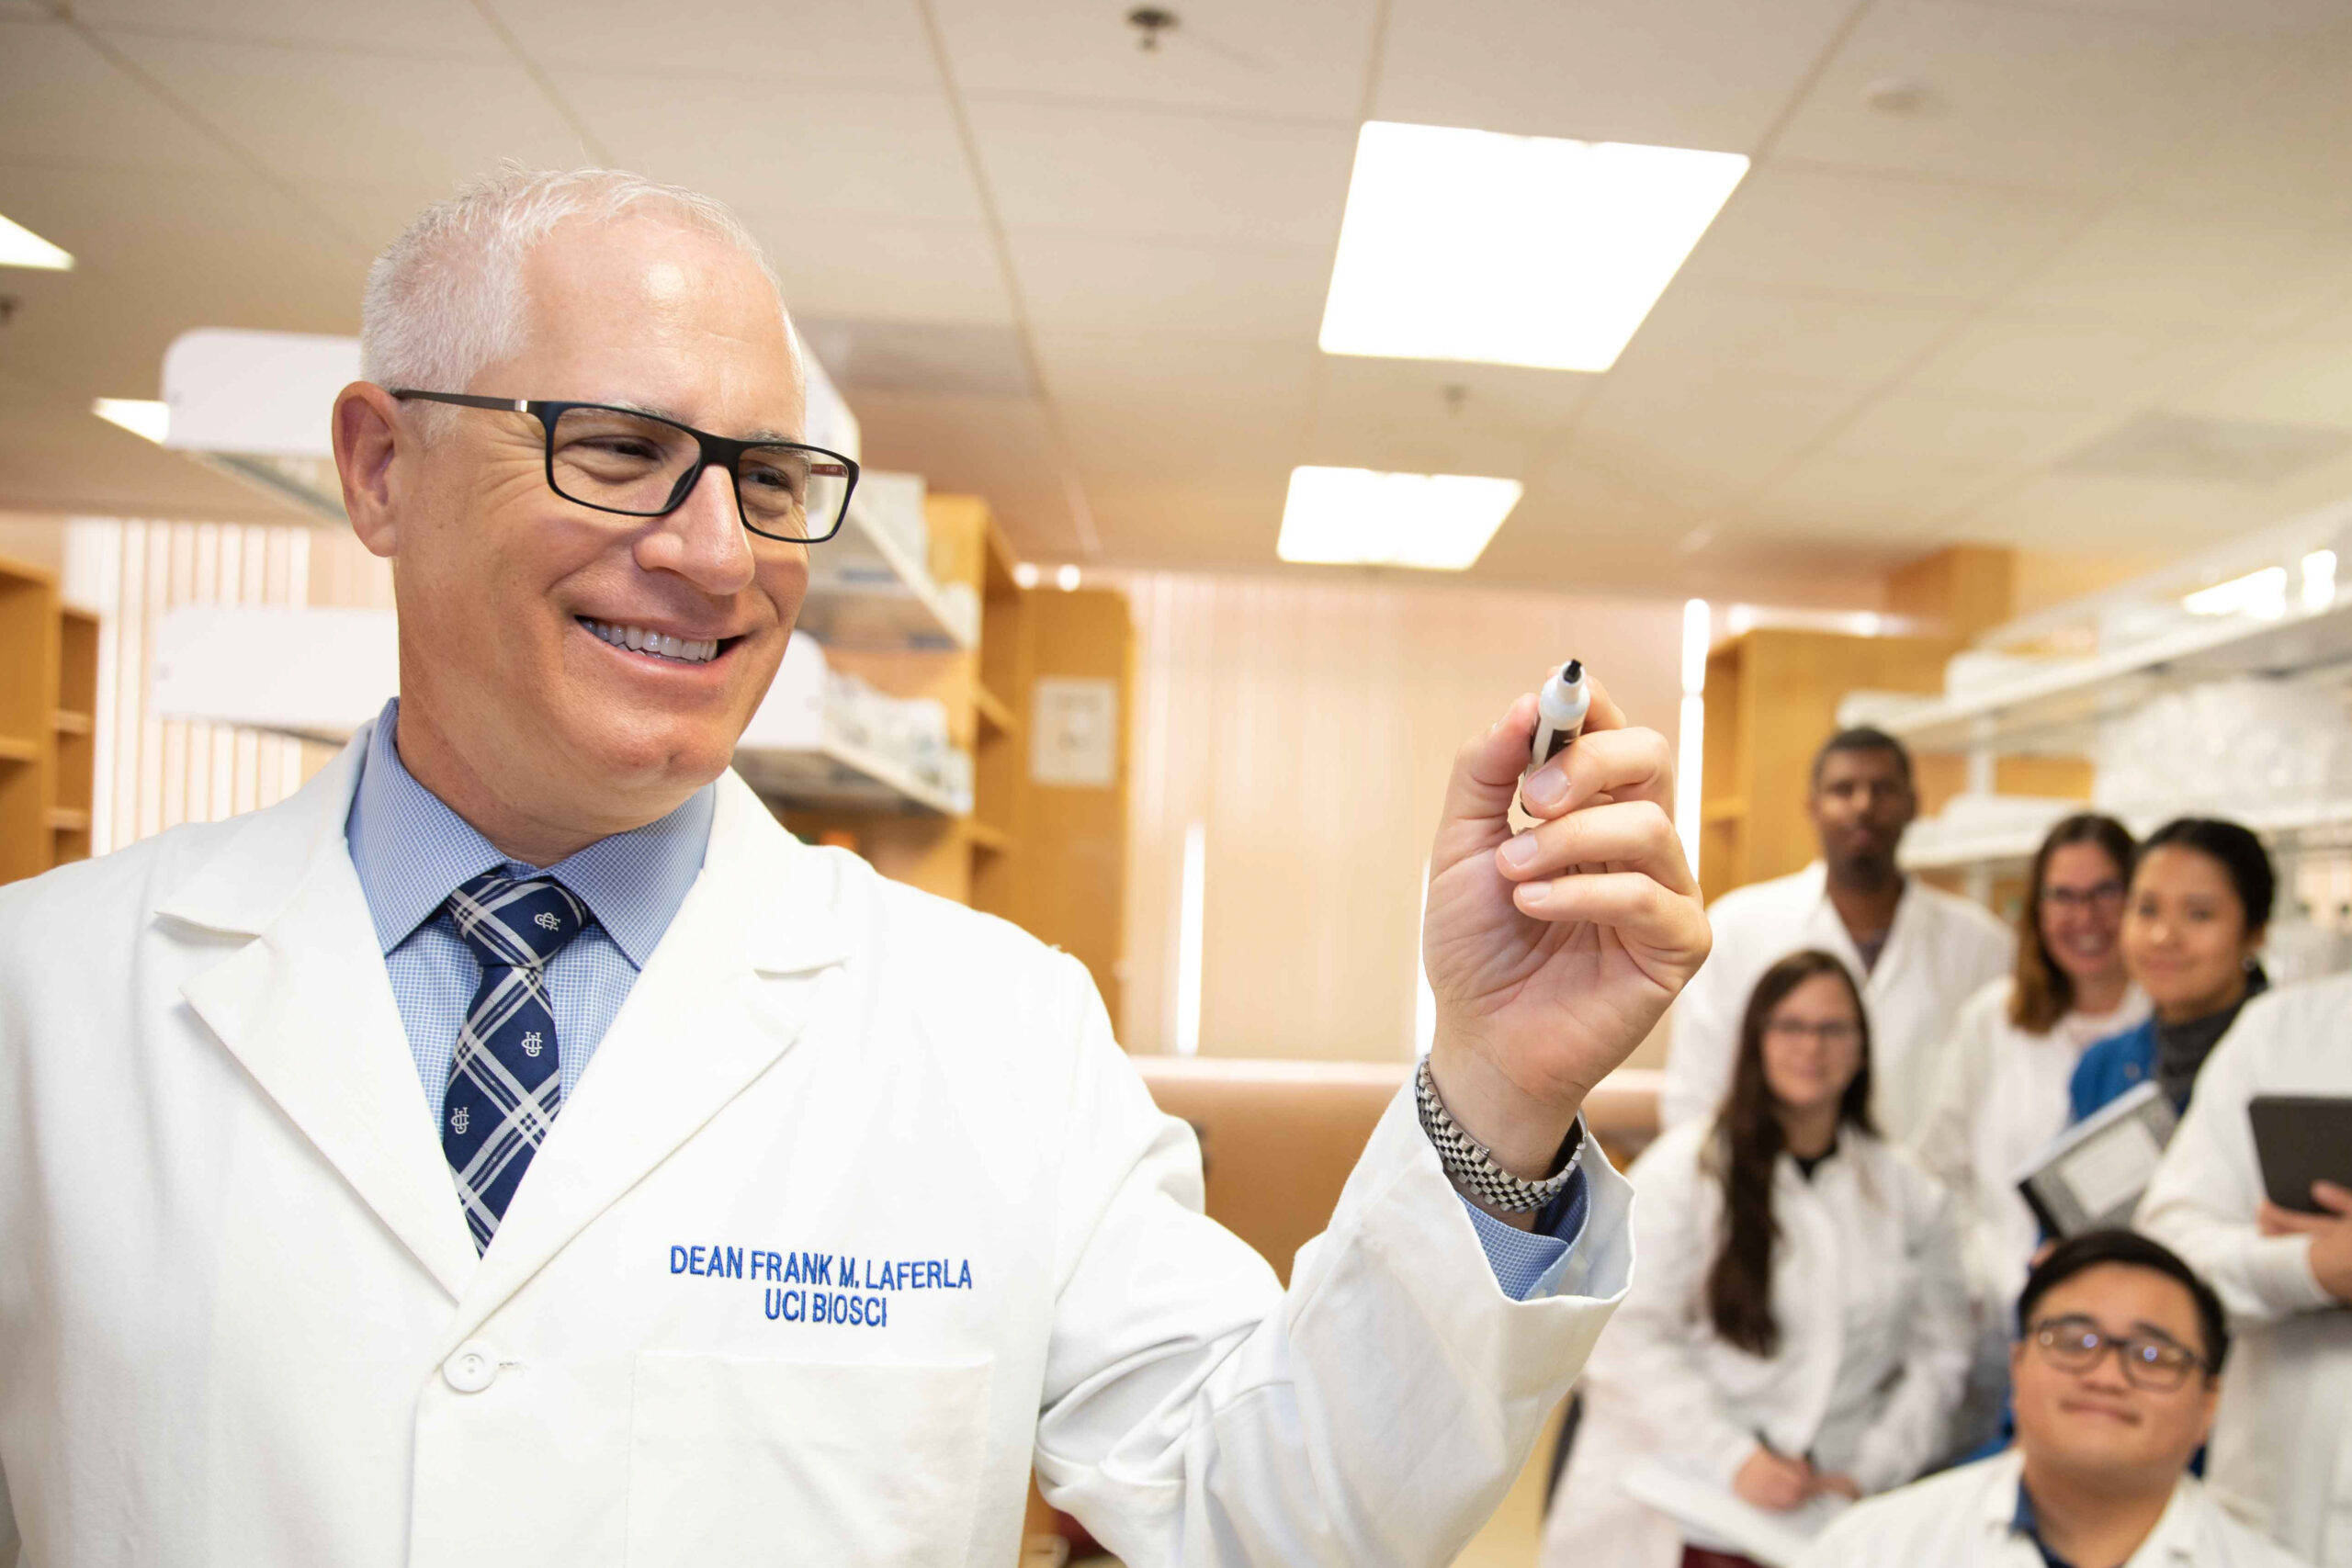 Dean Frank LaFerla in lab coat with lab staff